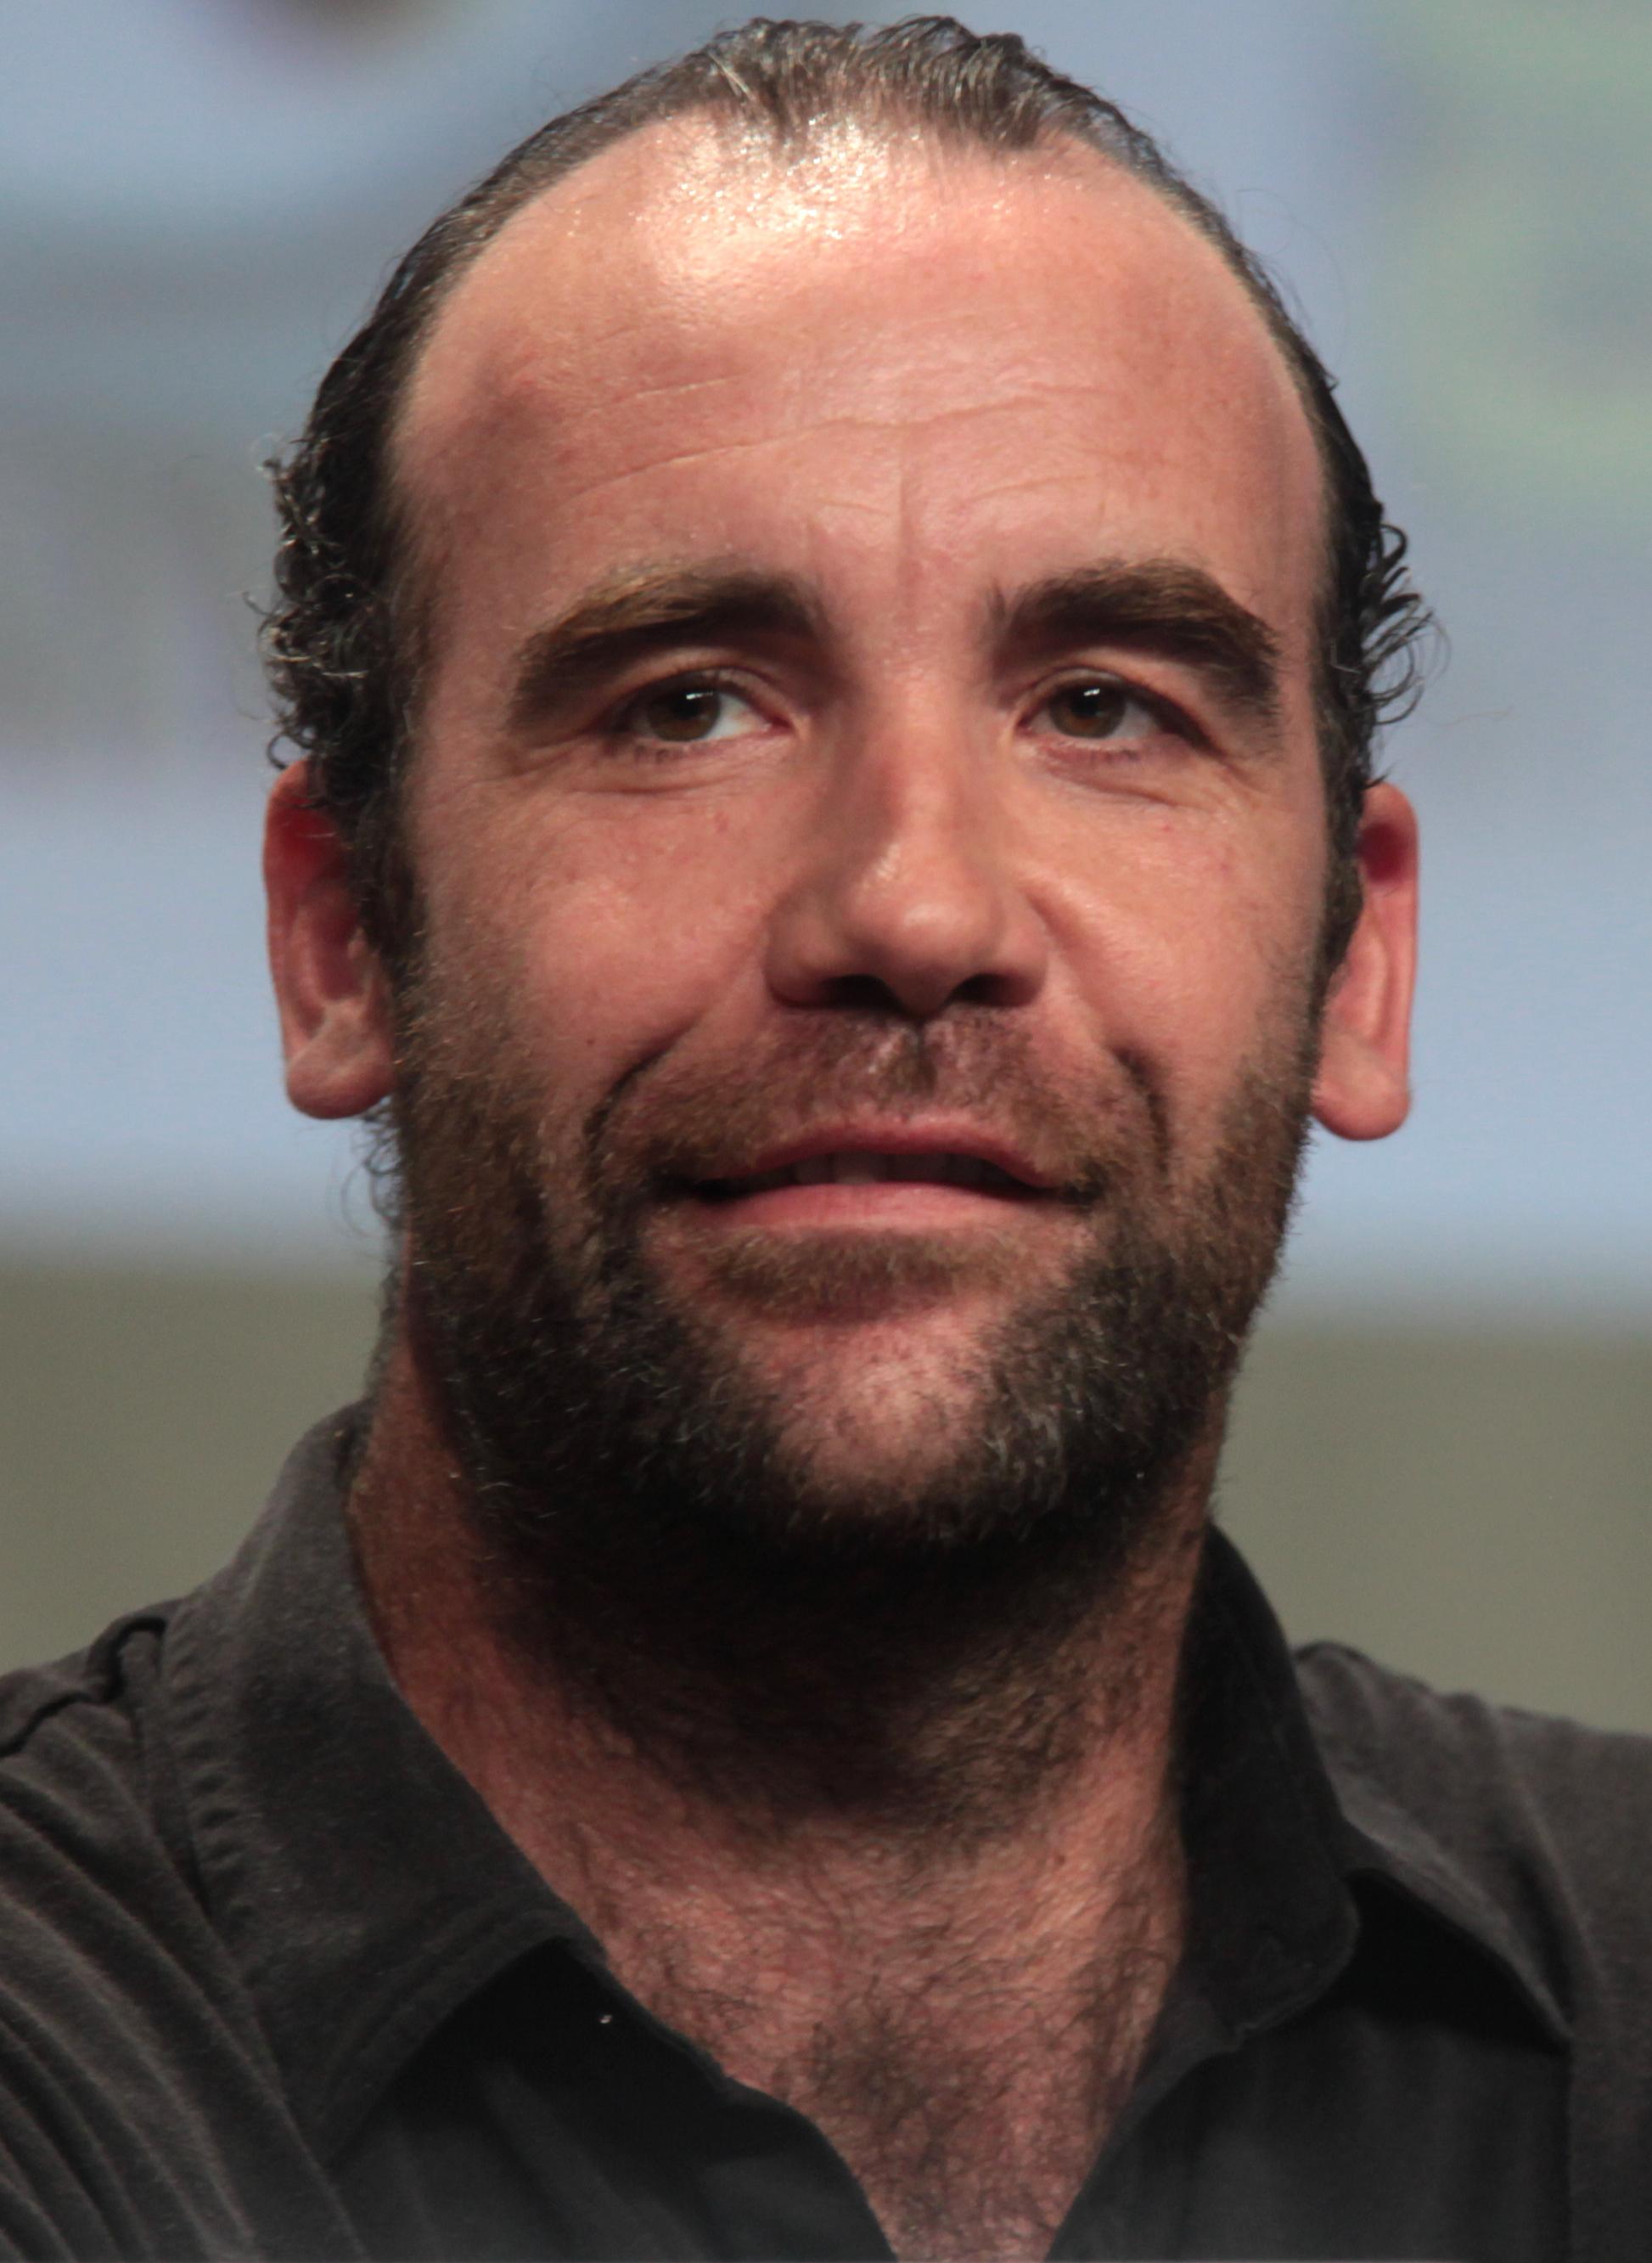 https://upload.wikimedia.org/wikipedia/commons/6/69/Rory_McCann_SDCC_2014.jpg